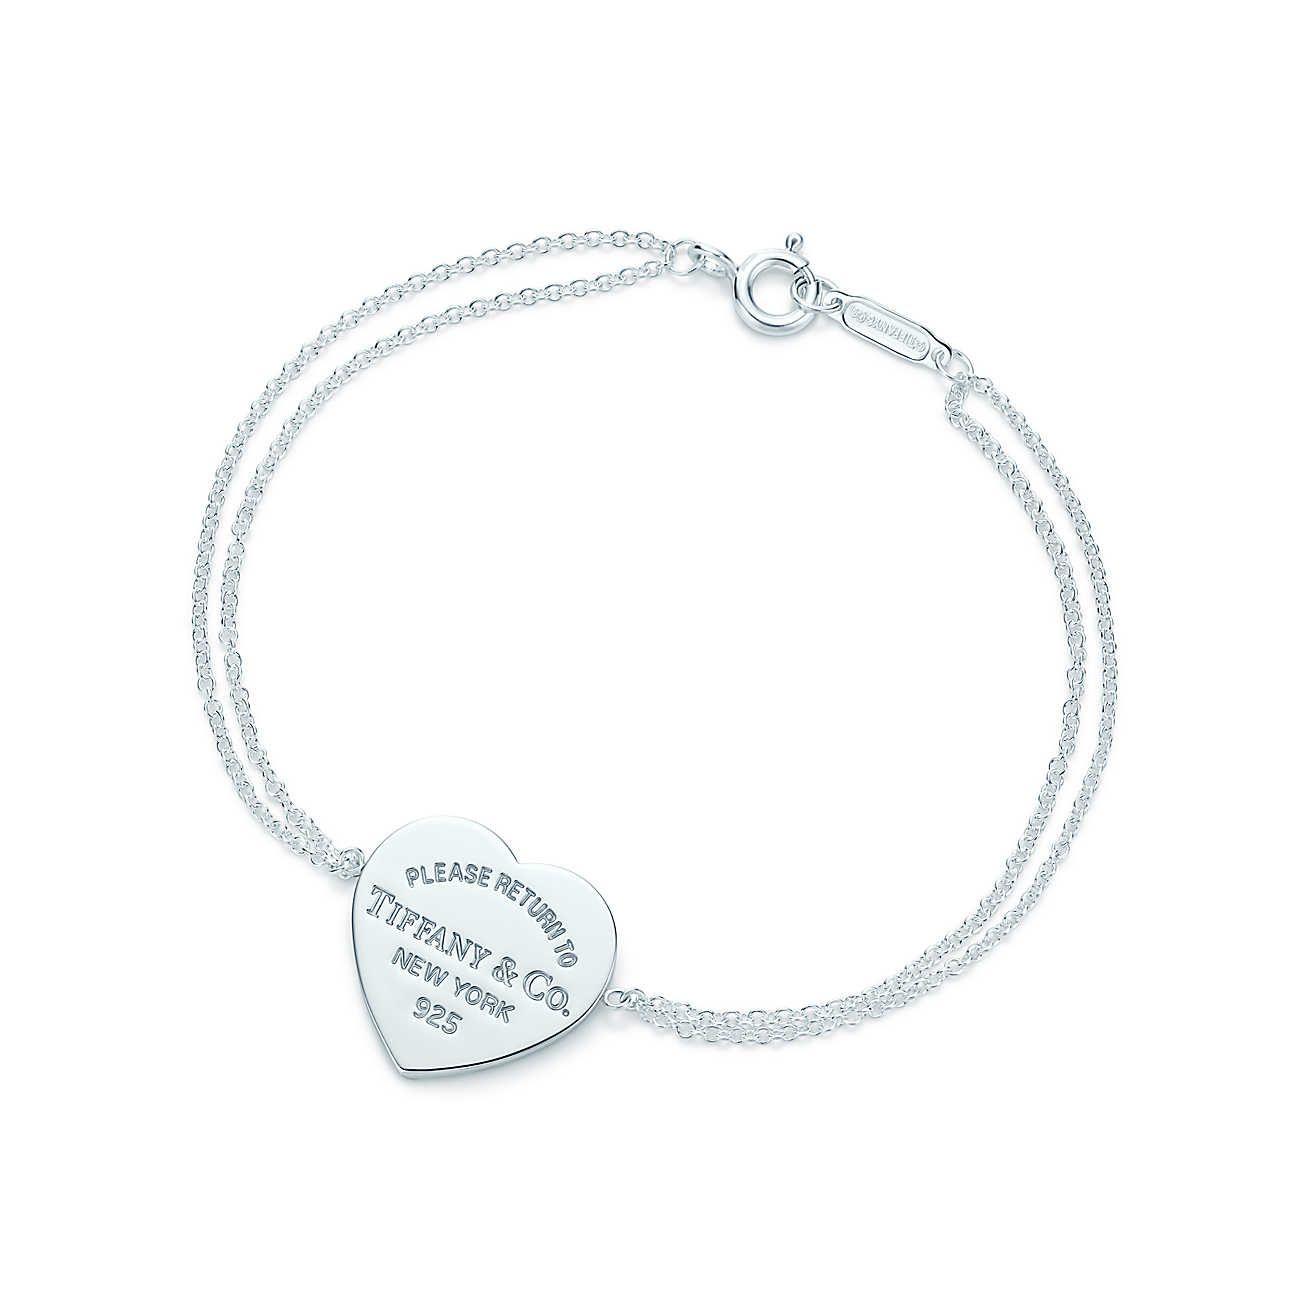 Tiffany armband online shop